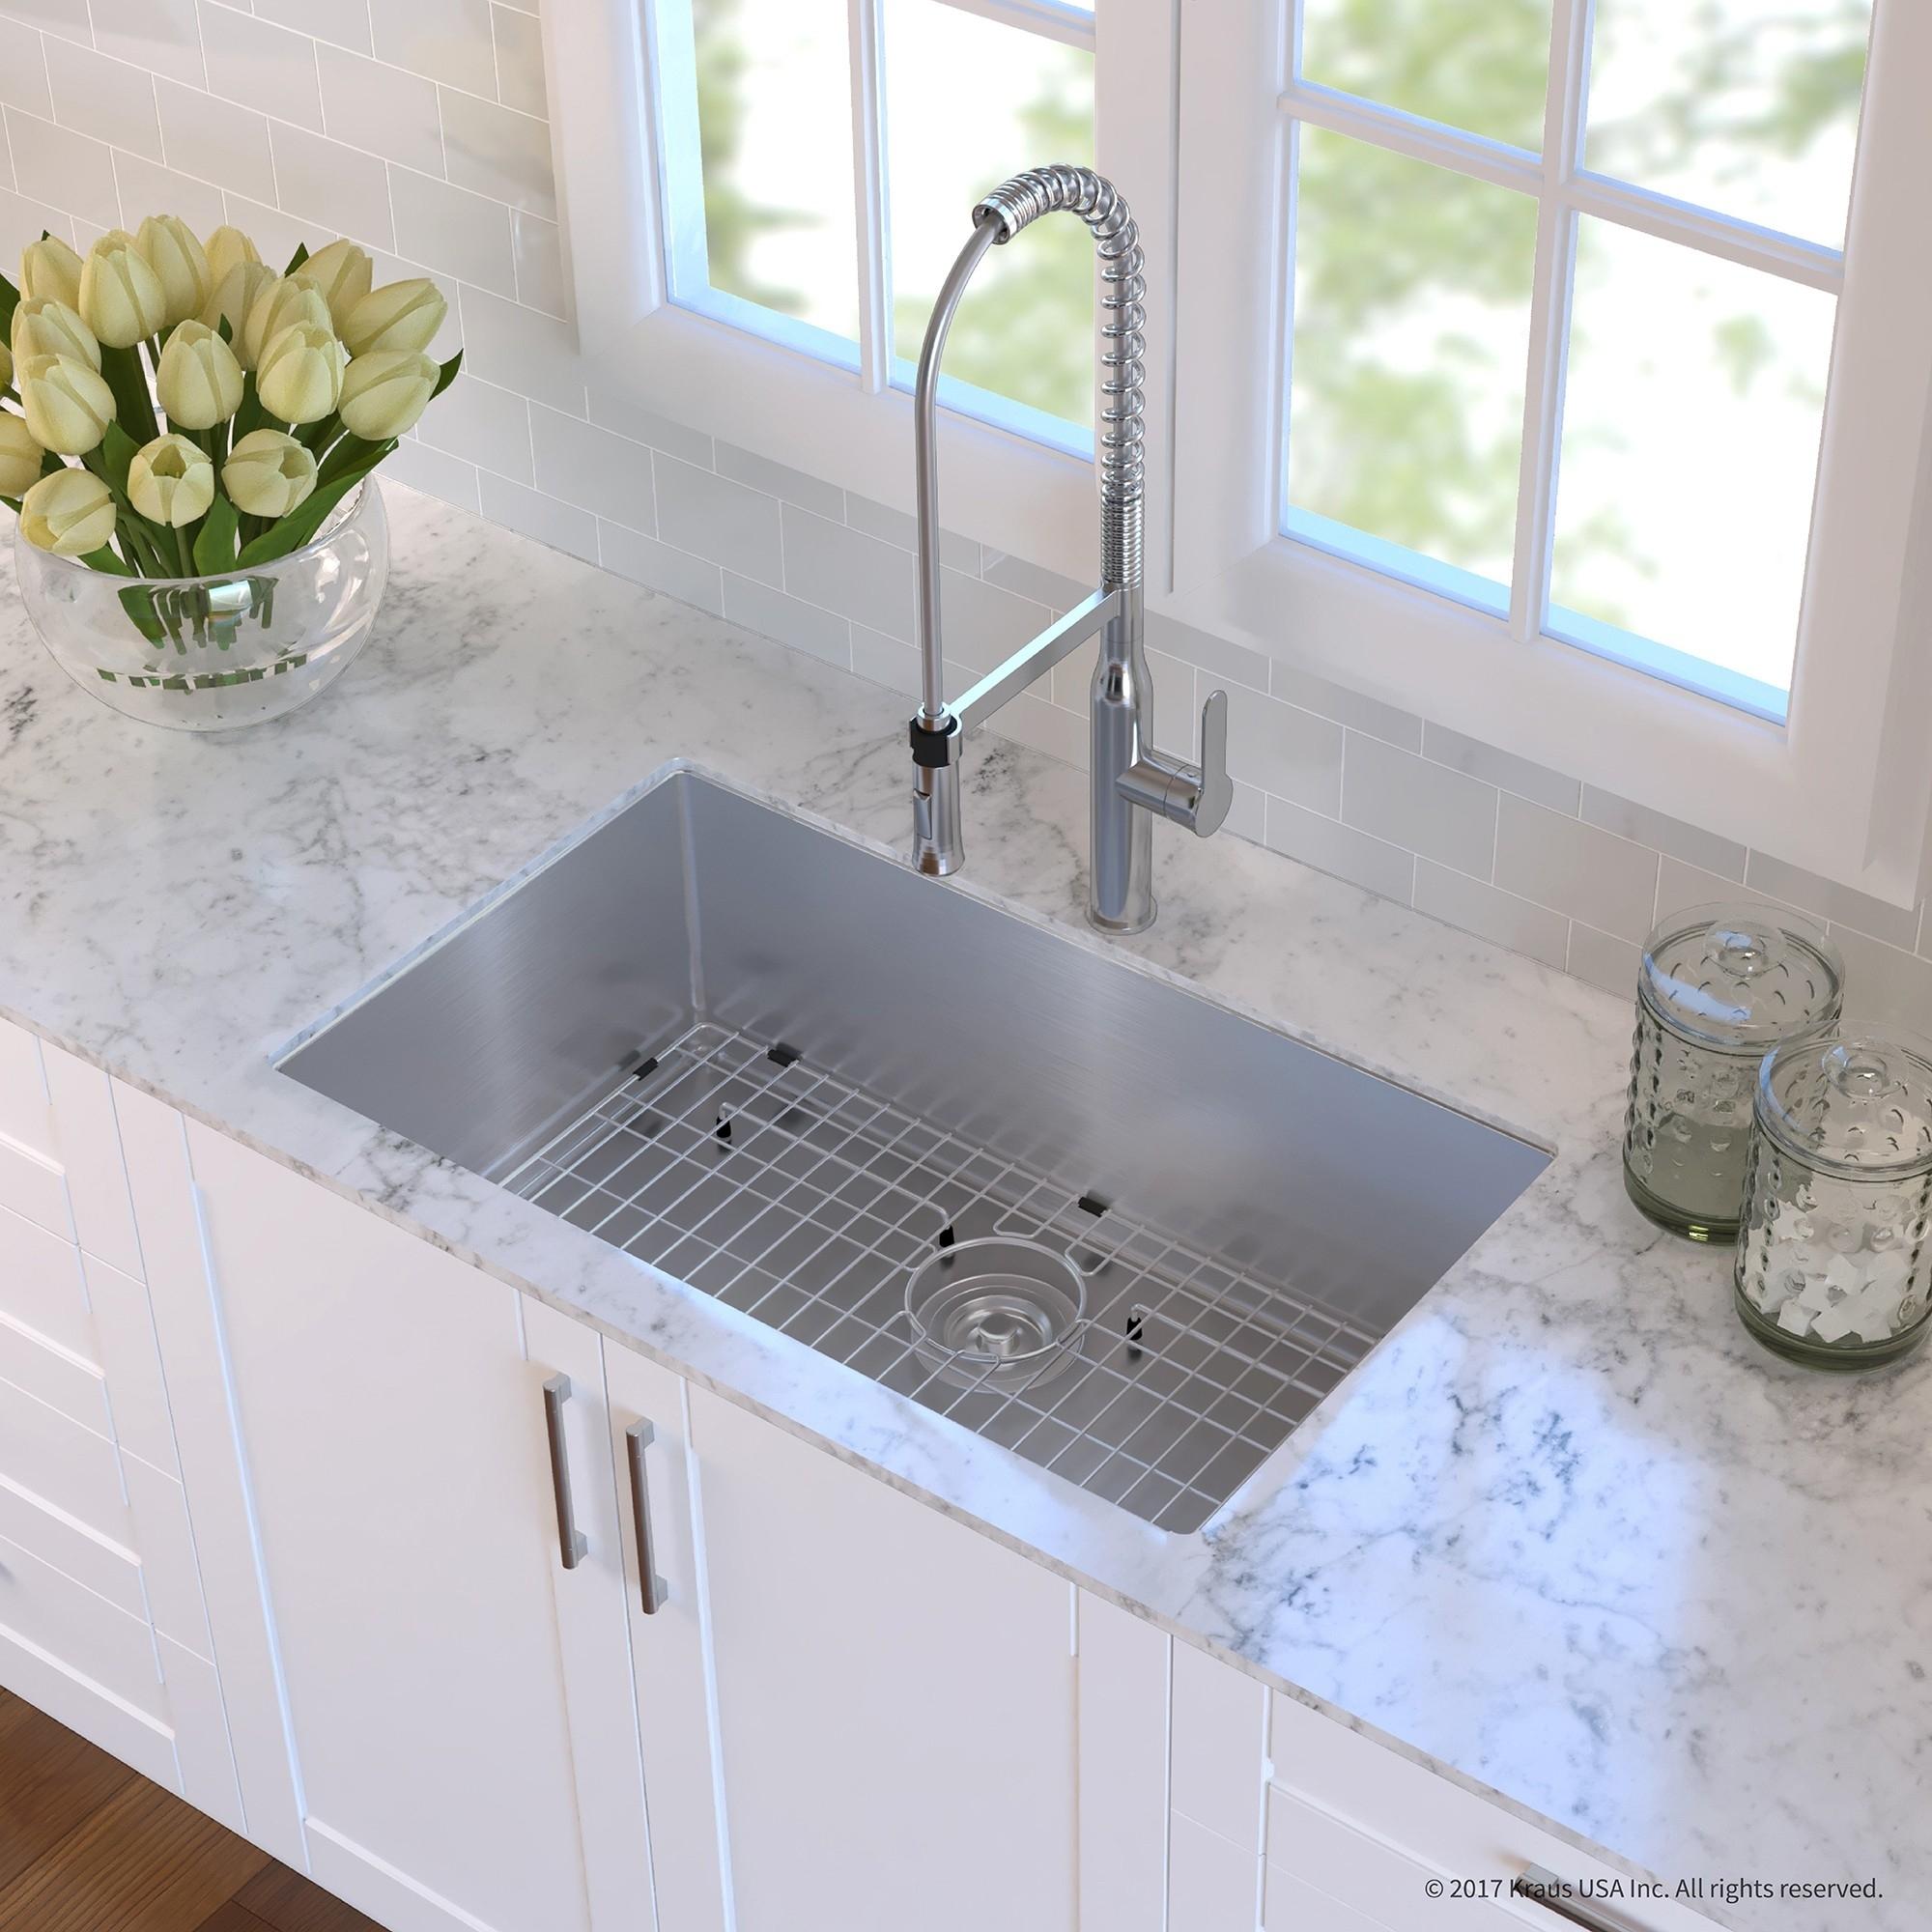 Commercial Kitchen Sink Height Madison Art Center Design